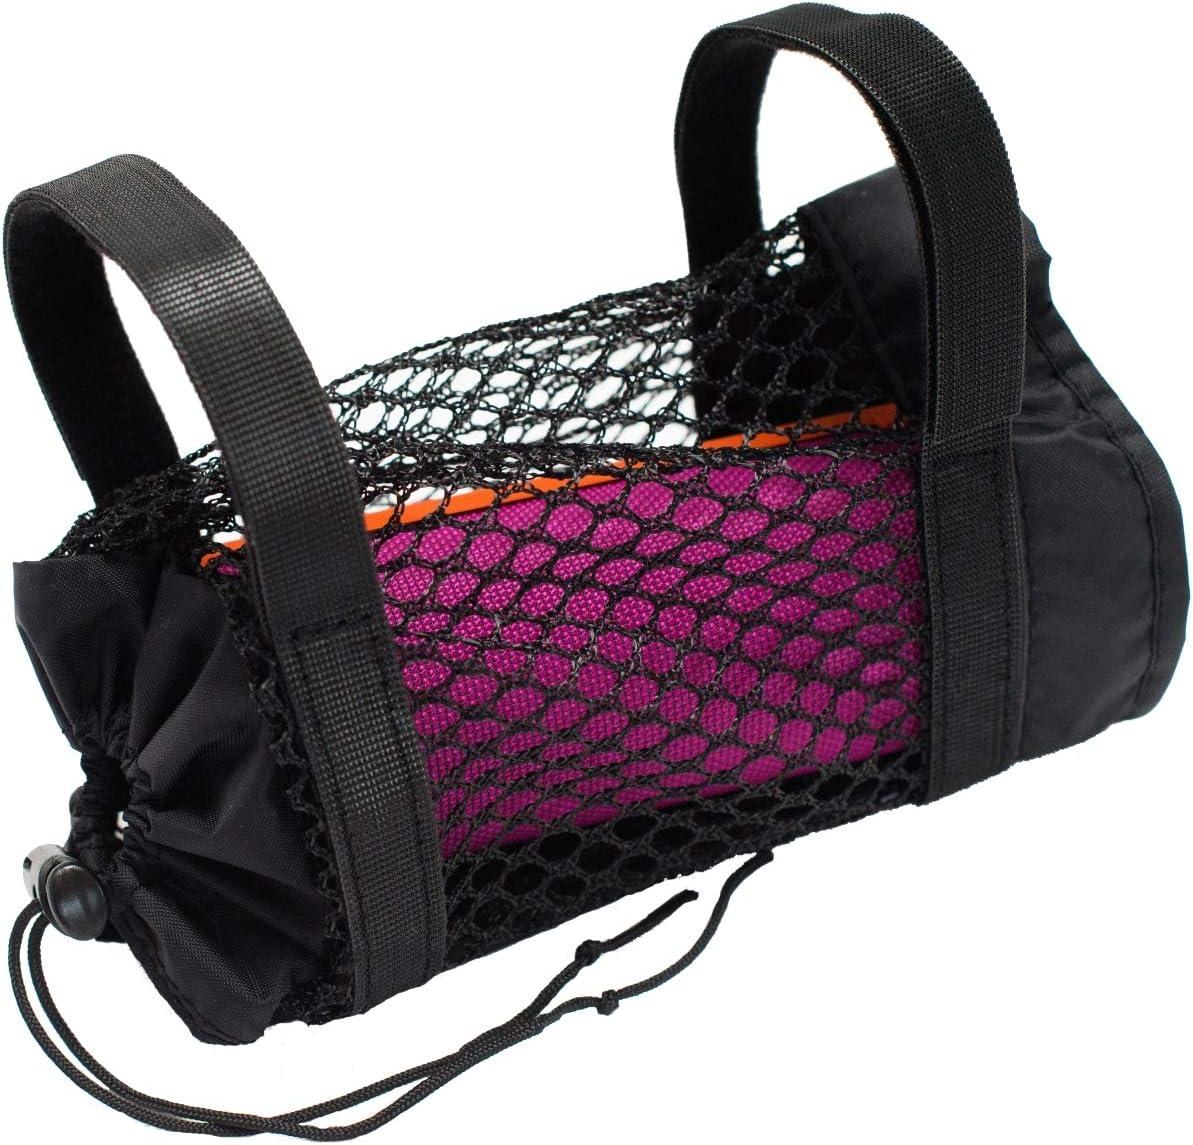 Portable Speaker Holder for Bikes, Adjustable Strap Mobile Case, Bicycle Riding Mount Attachment (Medium)